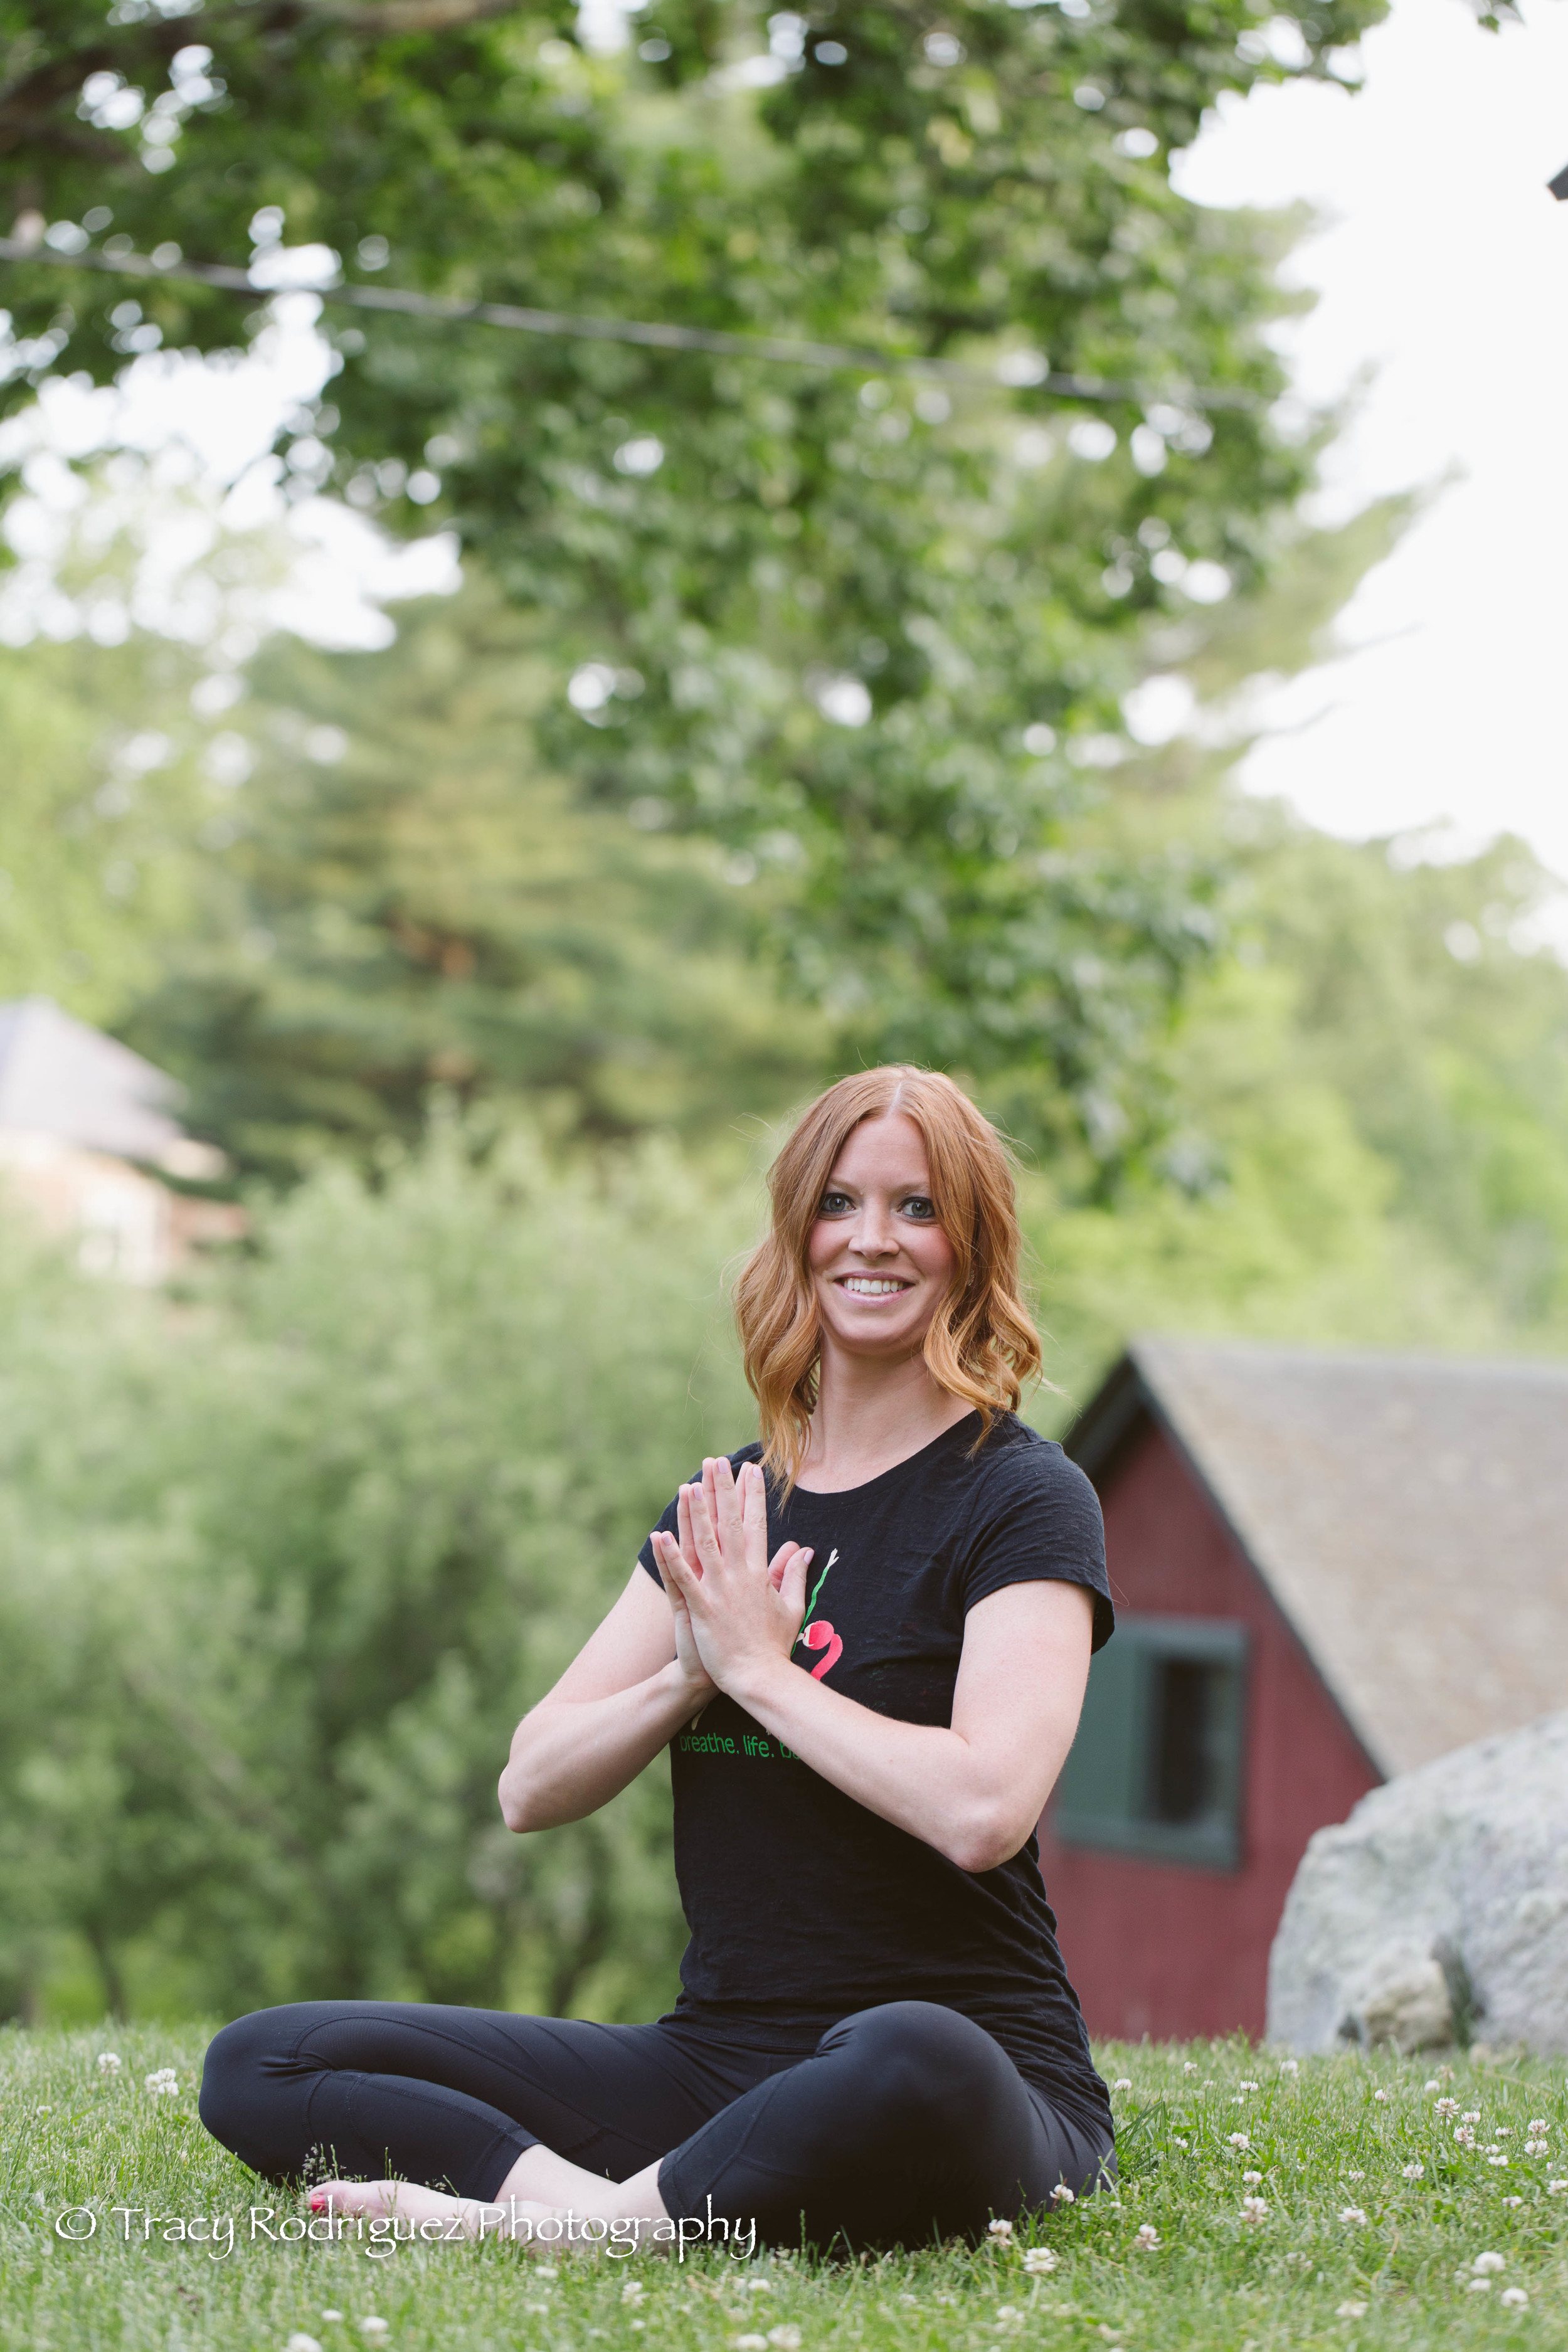 TracyRodriguezPhotography-Kelly-8.jpg